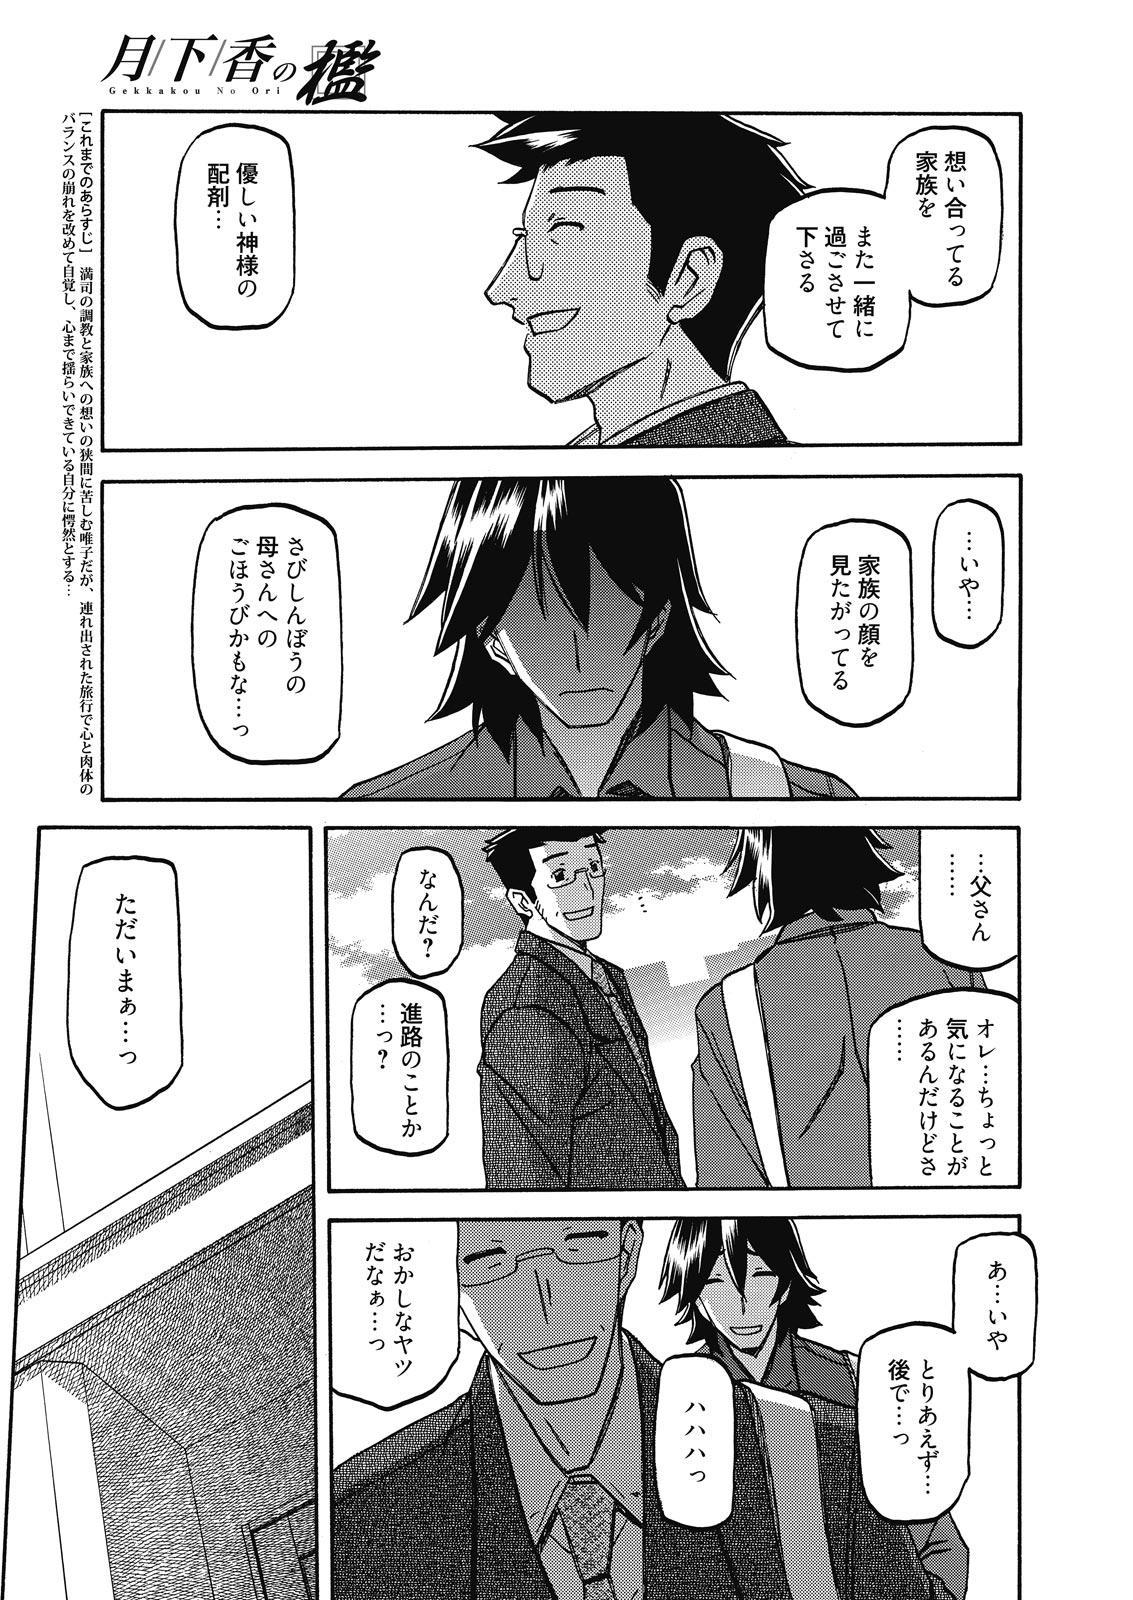 Web Manga Bangaichi Vol. 7 48